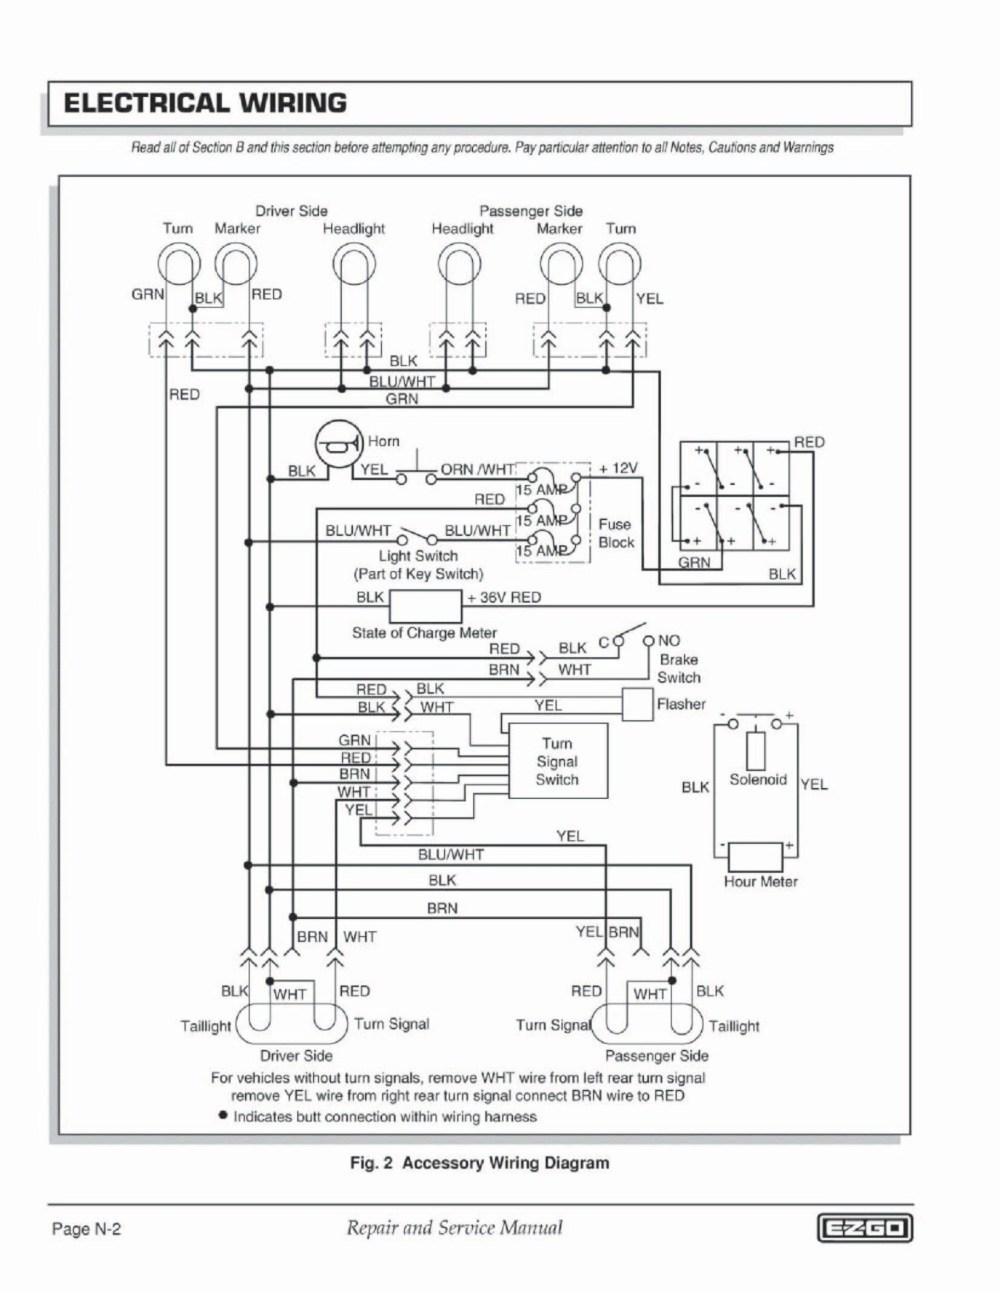 medium resolution of ezgo marathon wiring diagram wiring diagram for ezgo txt refrence ez go headlight wiring diagram